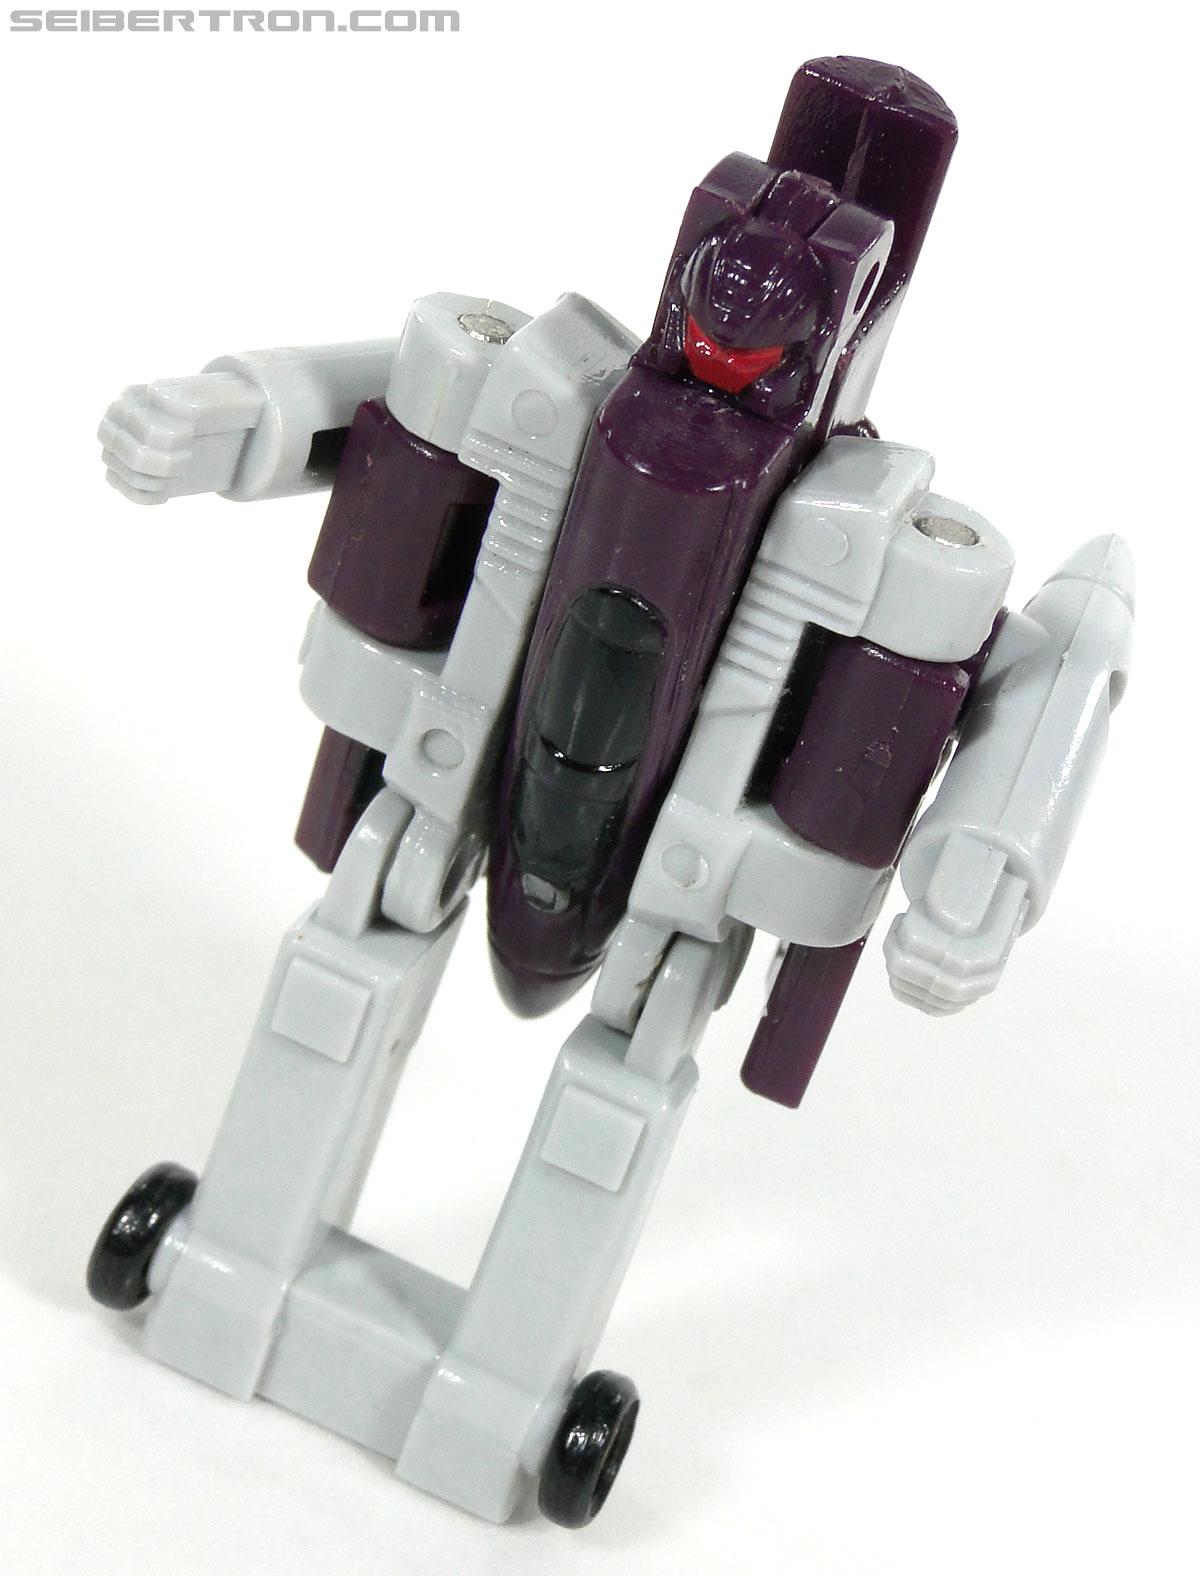 Transformers G1 1989 Flattop (Skywave) (Image #104 of 118)